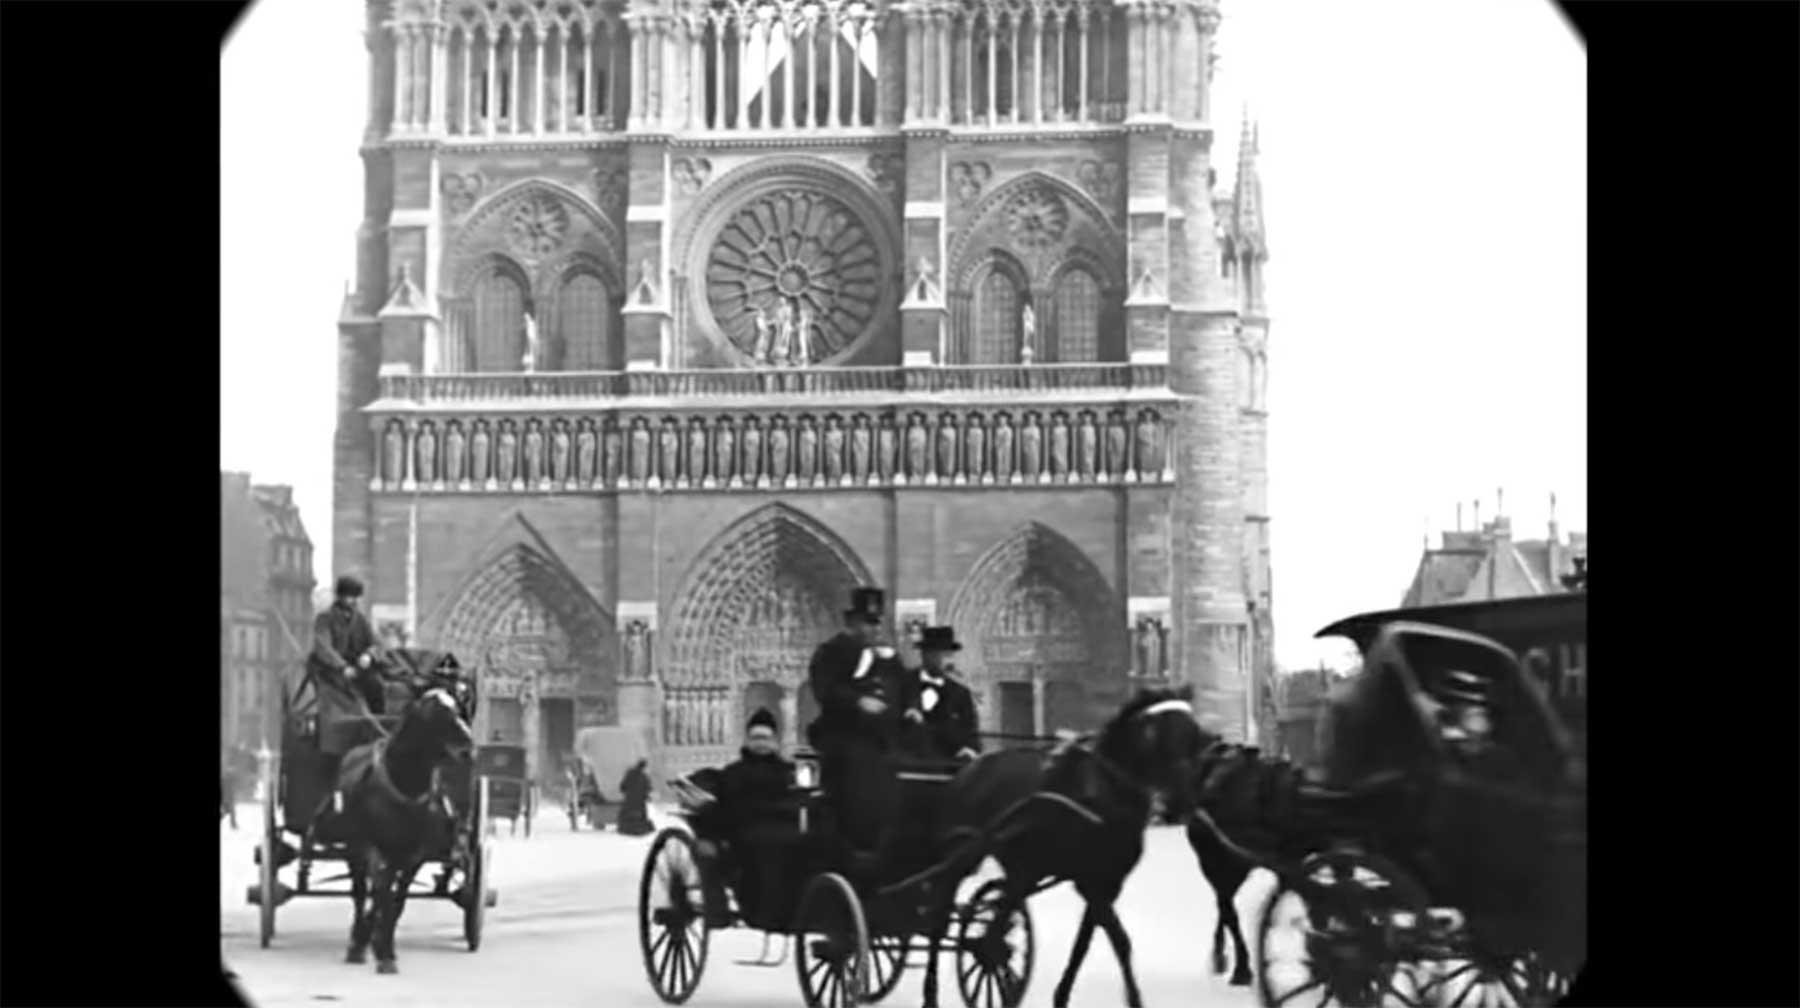 Video aus dem Paris der 1890er Jahre paris-1896-1900-video